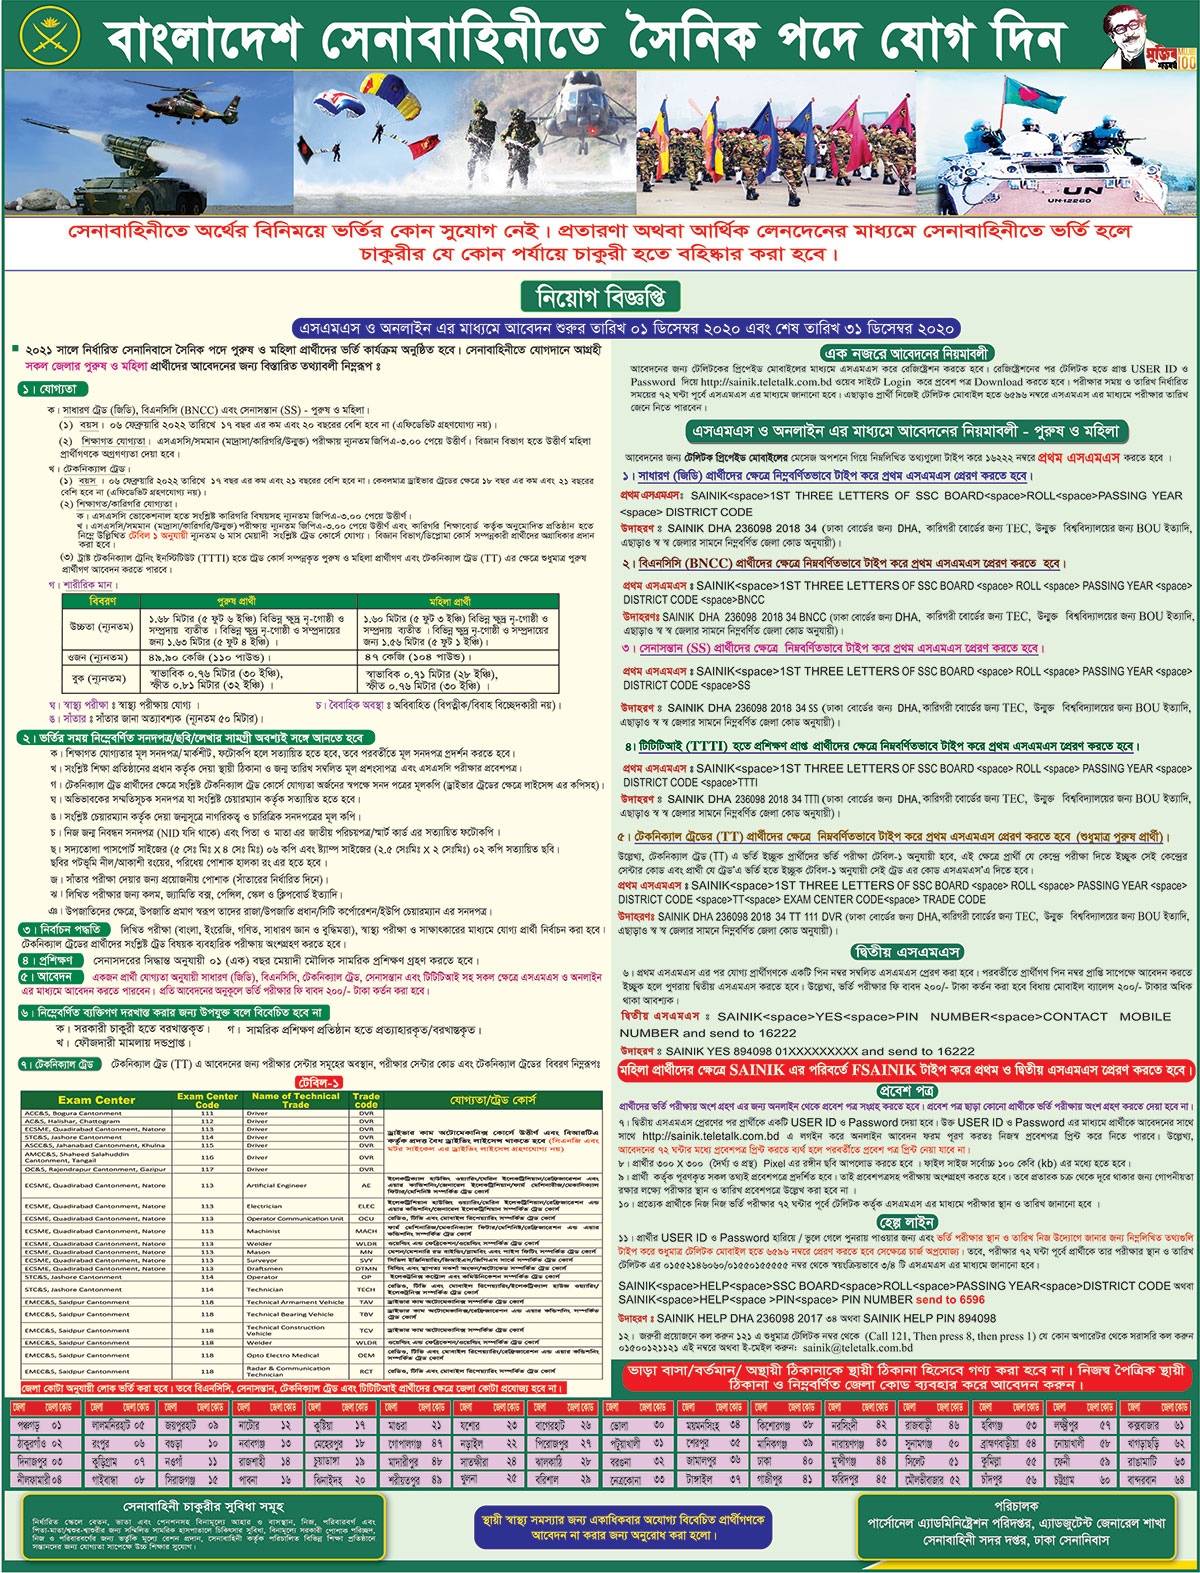 bangladesh army job circular 2020-2021